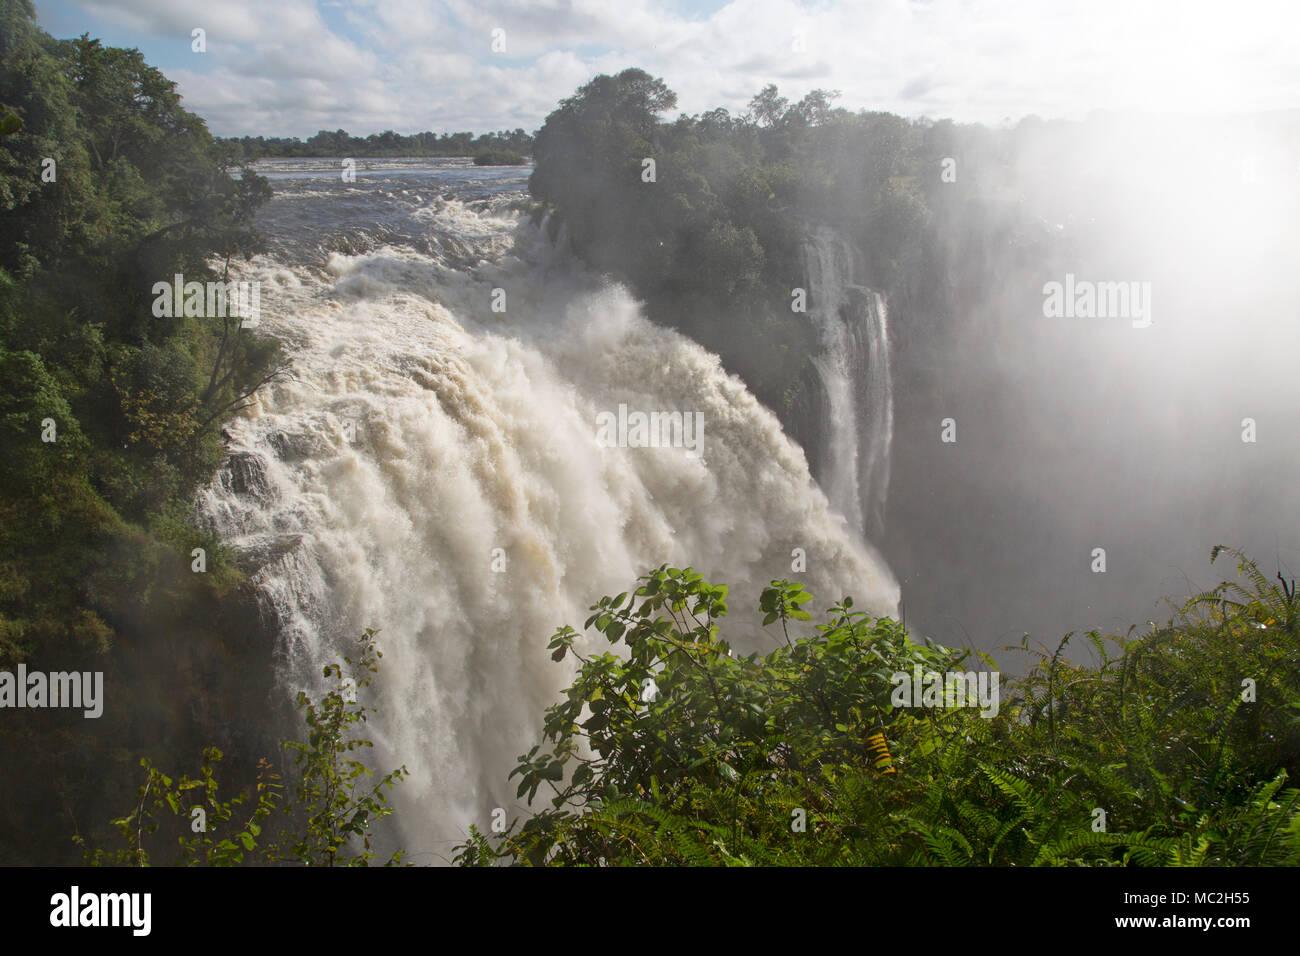 Des Teufels Katarakt bei Victoria Falls (Mosi-oa-Tunya) an der Grenze zwischen Simbabwe und Sambia. Stockbild